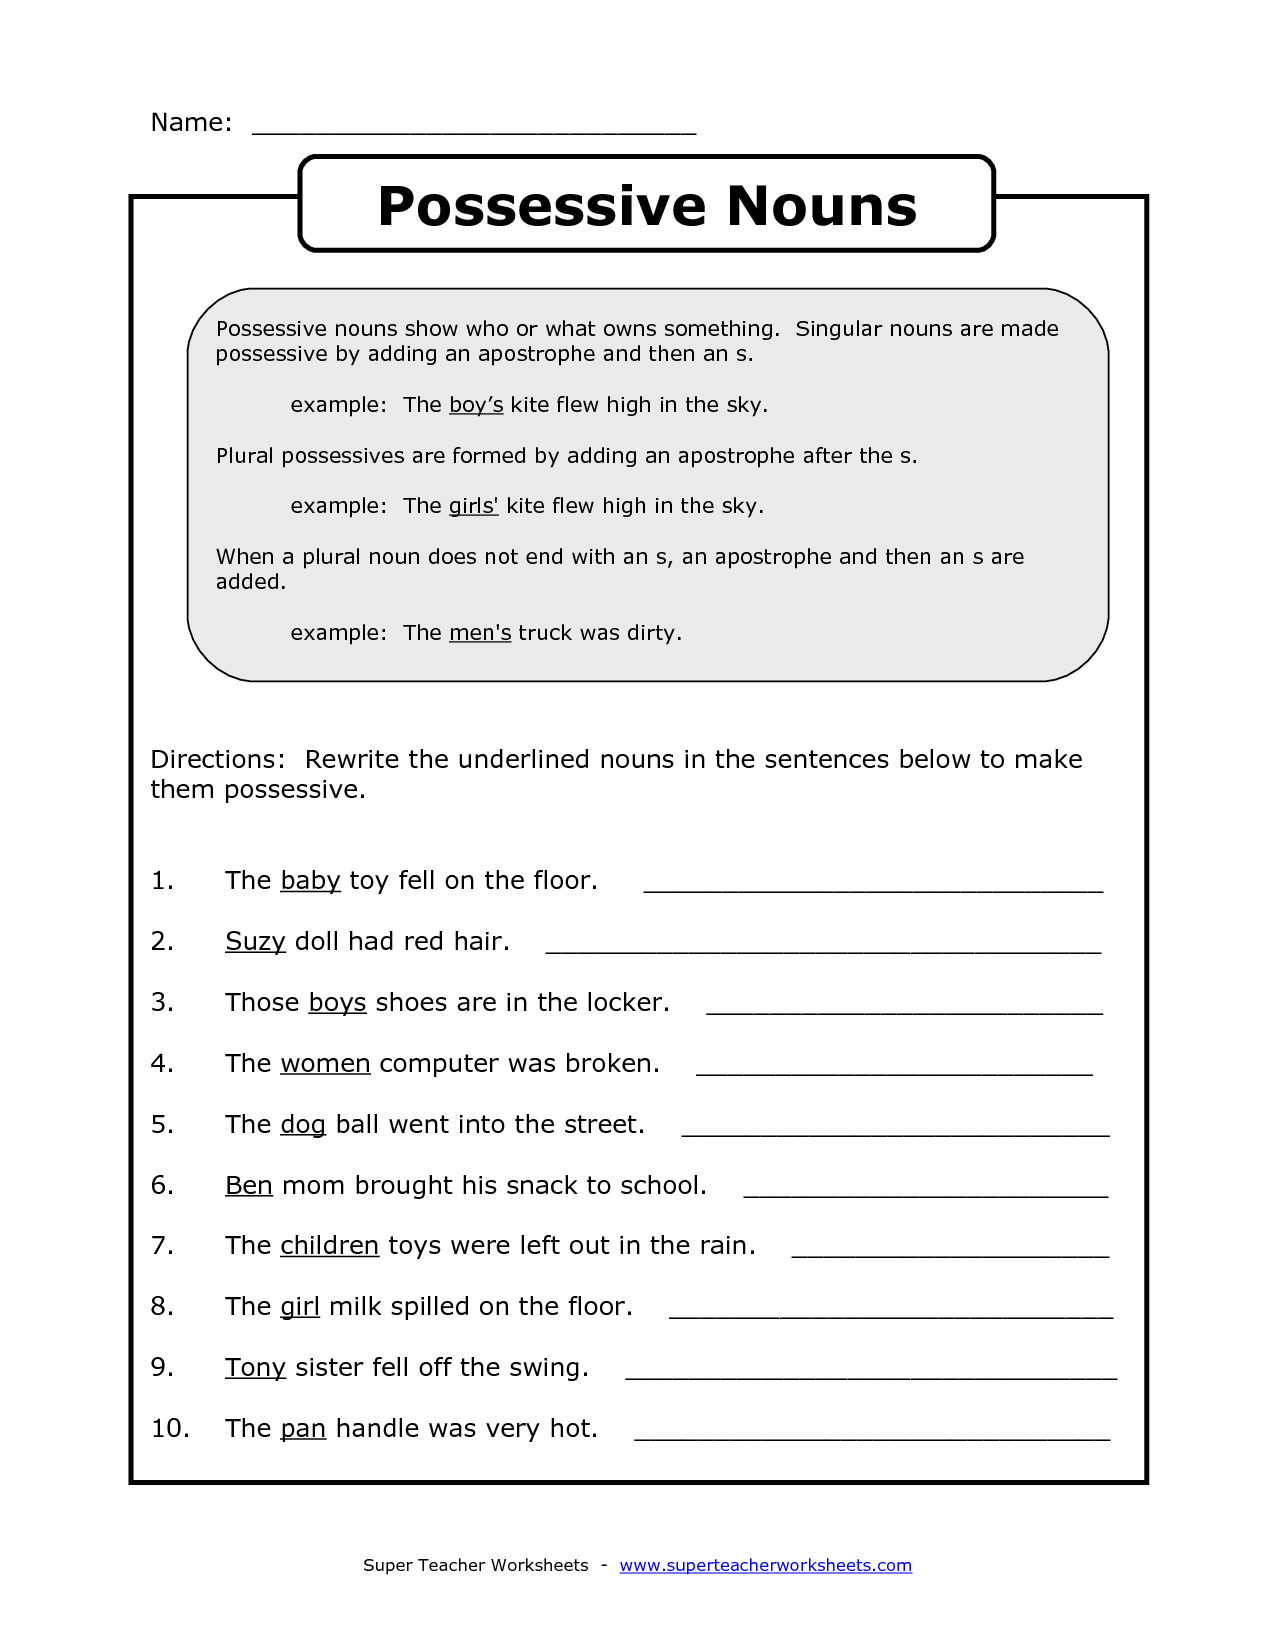 17 Best Images Of Worksheets Possessive Nouns